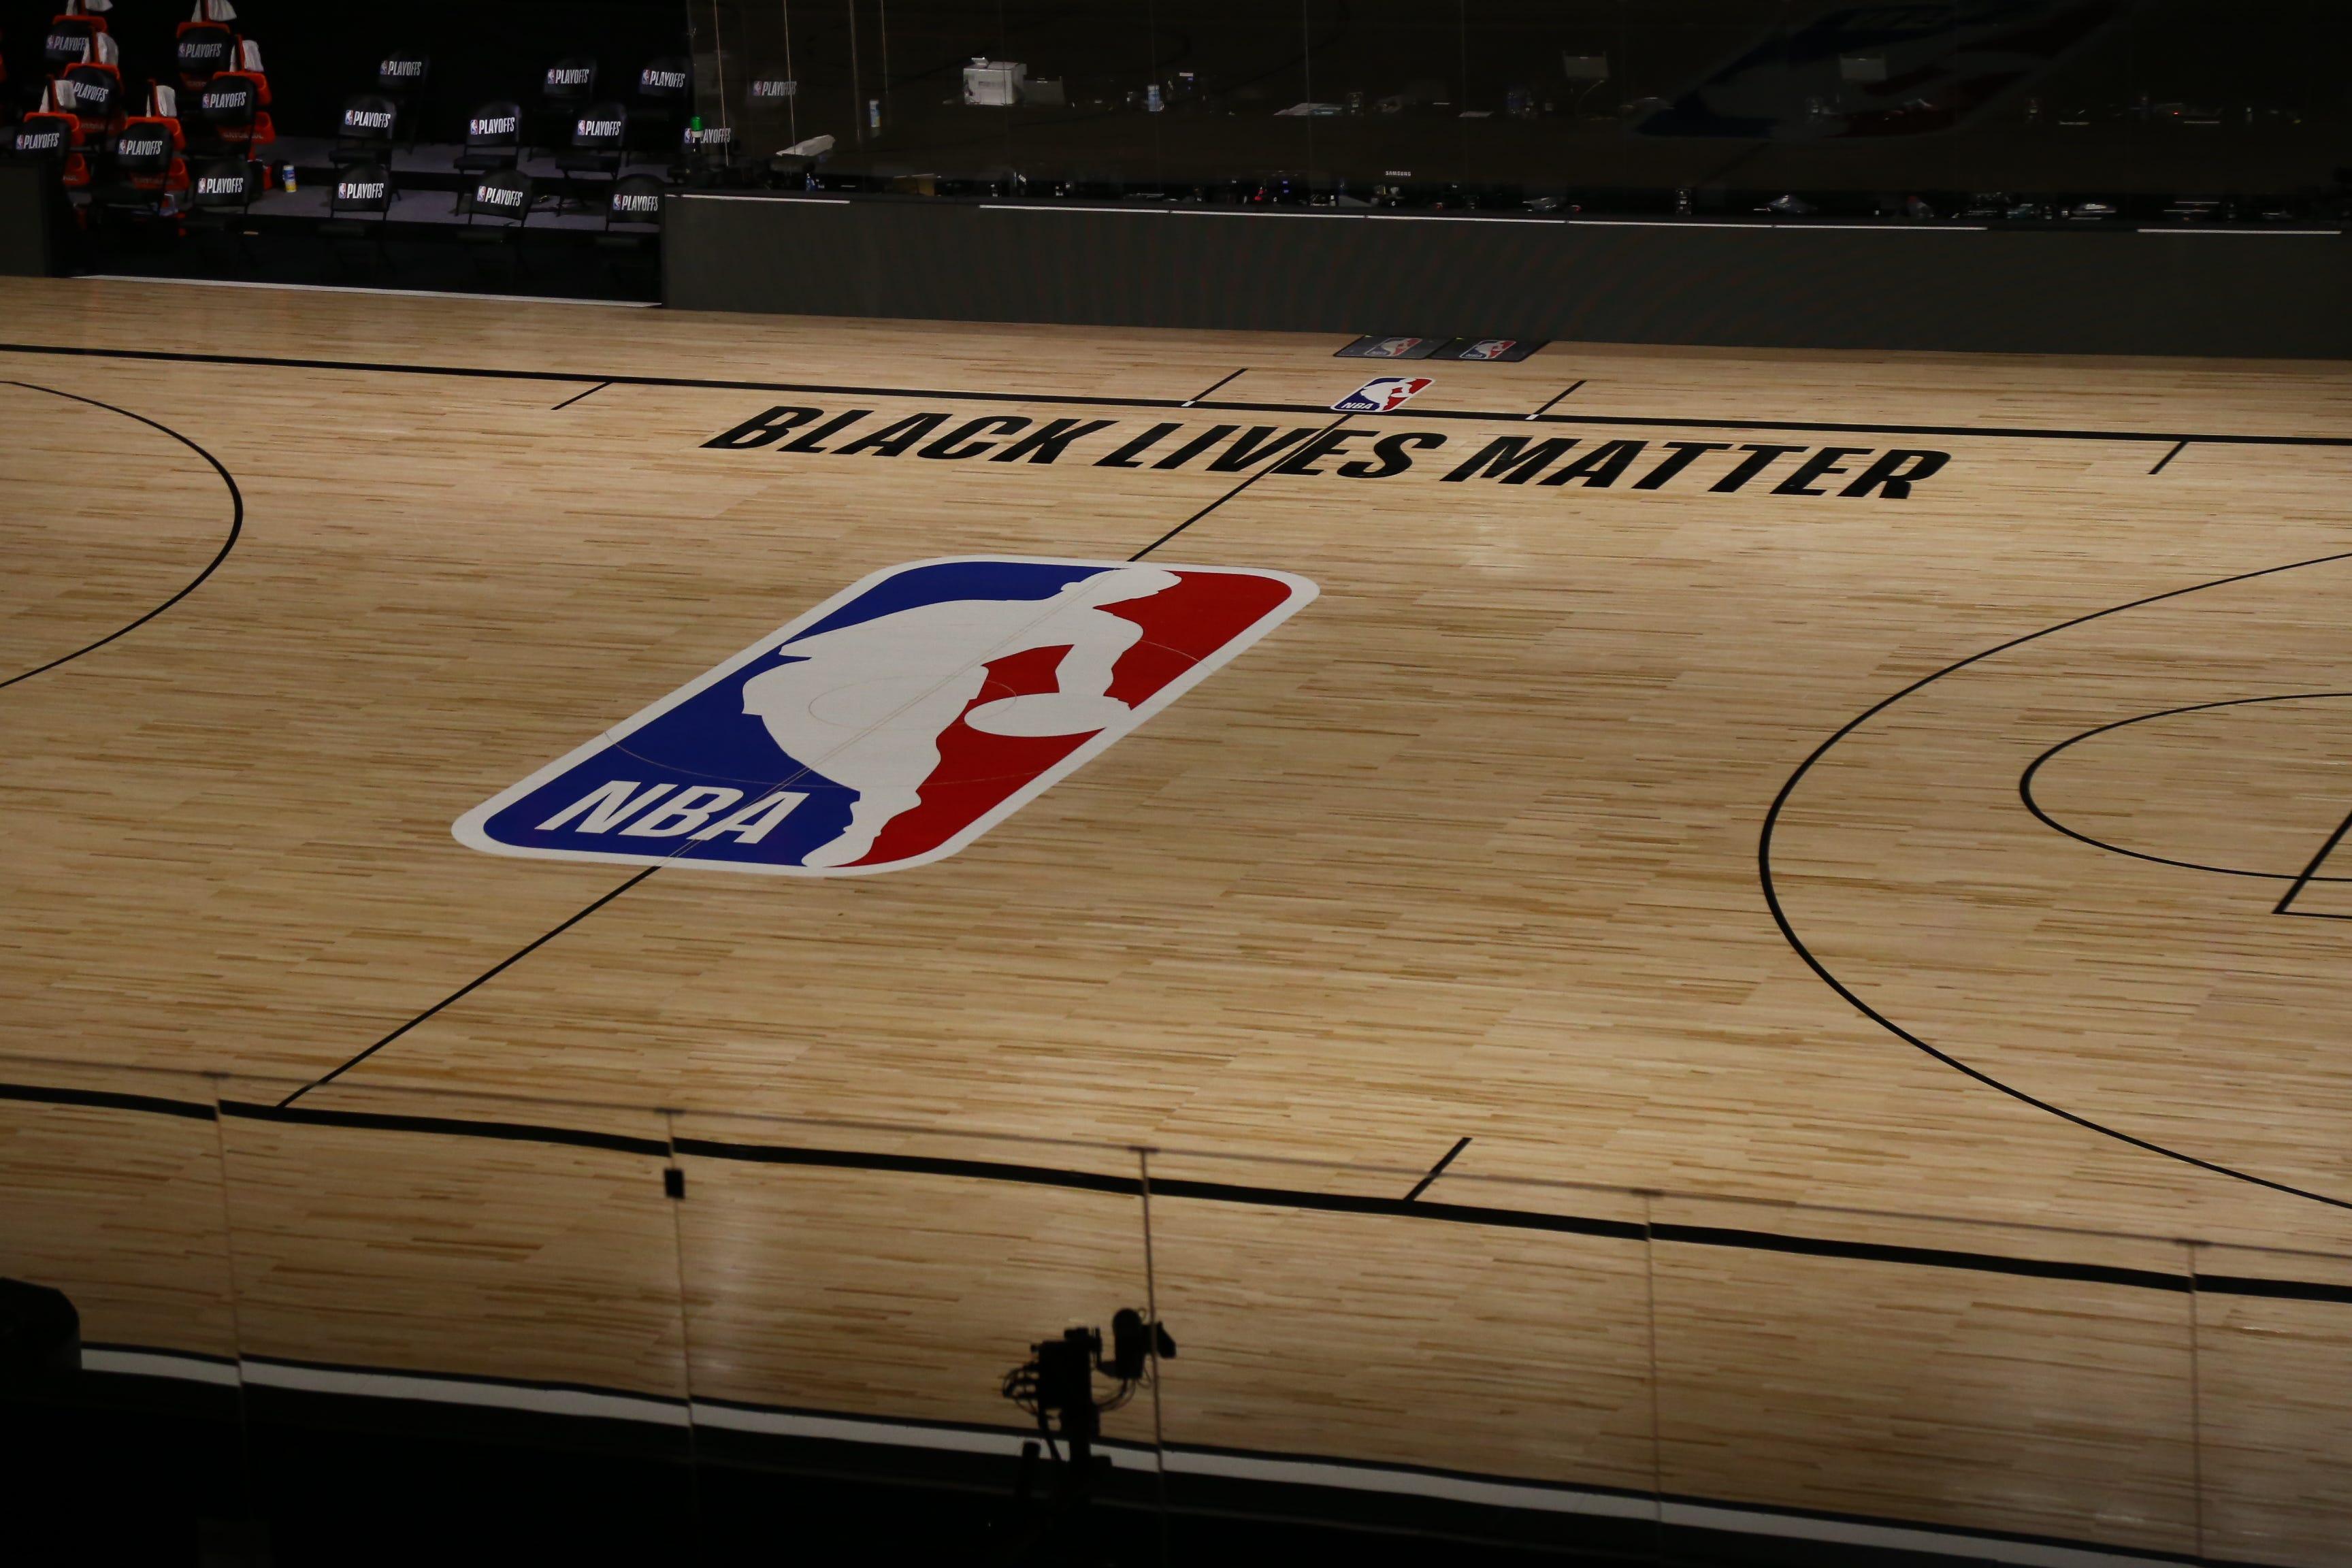 Start date for free agency, salary cap established for 2020-21 NBA season